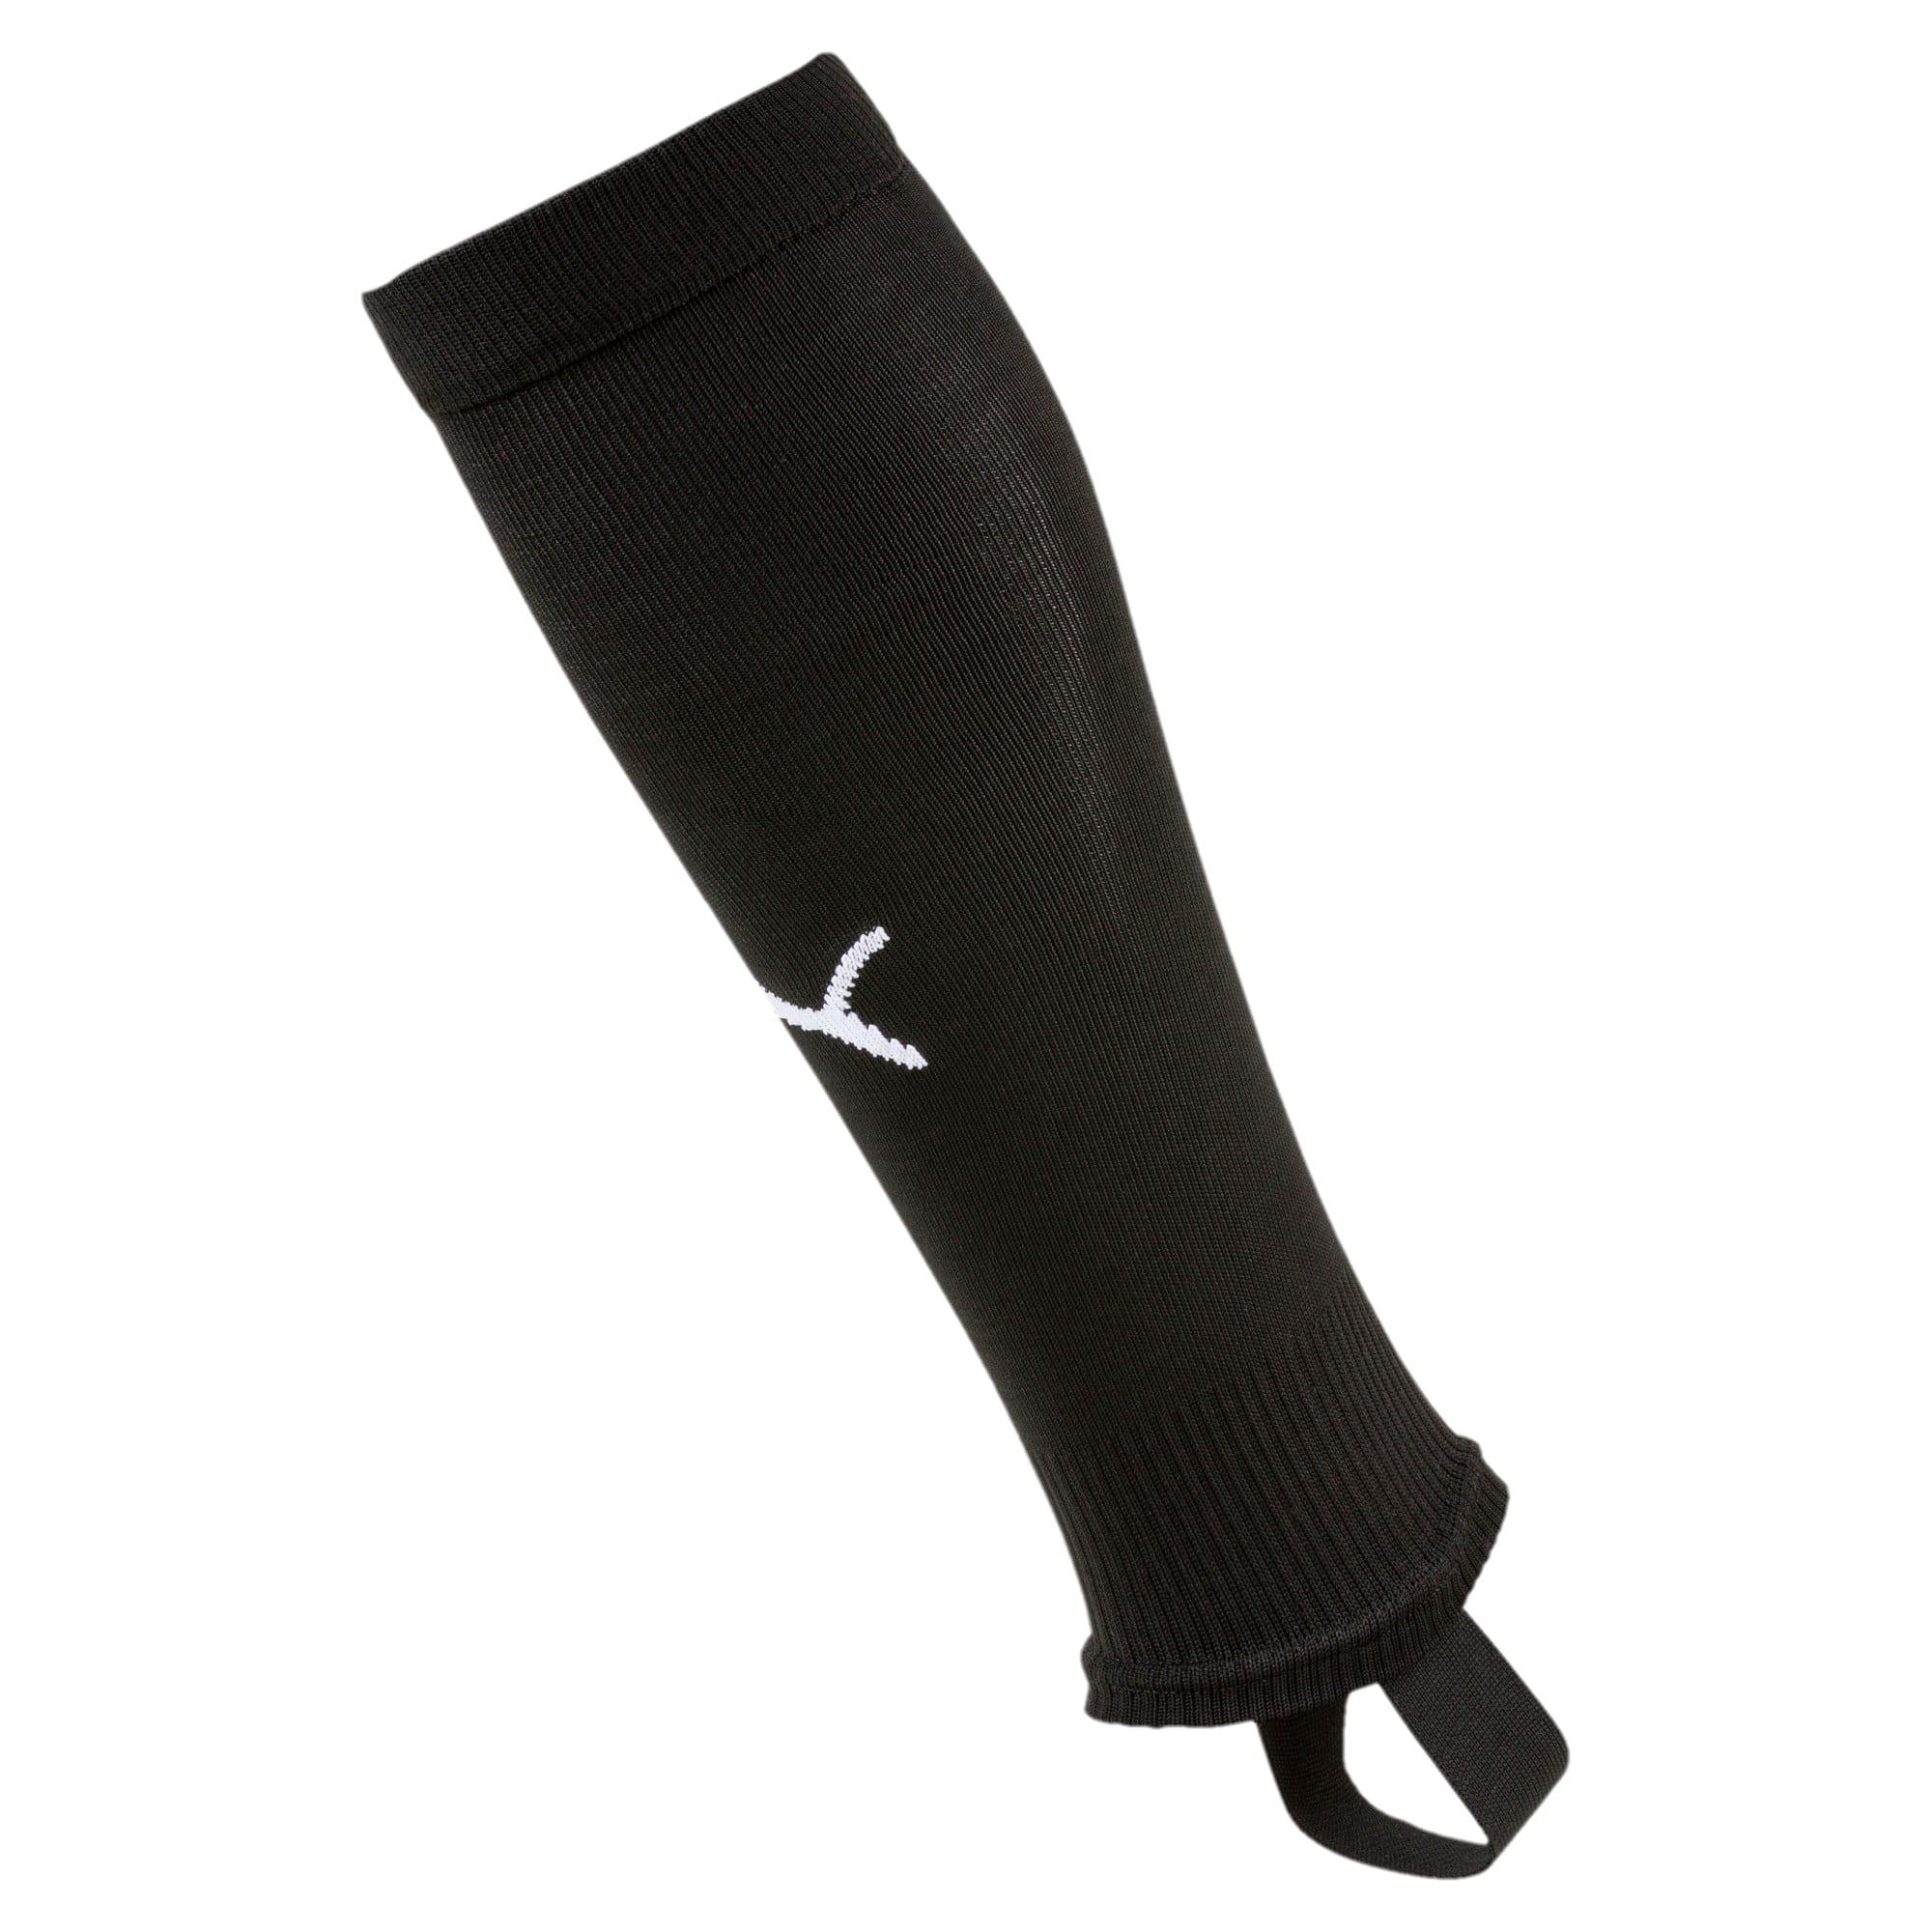 Thumbnail 1 of LIGA Stirrup Men's Football Socks, Puma Black-Puma White, medium